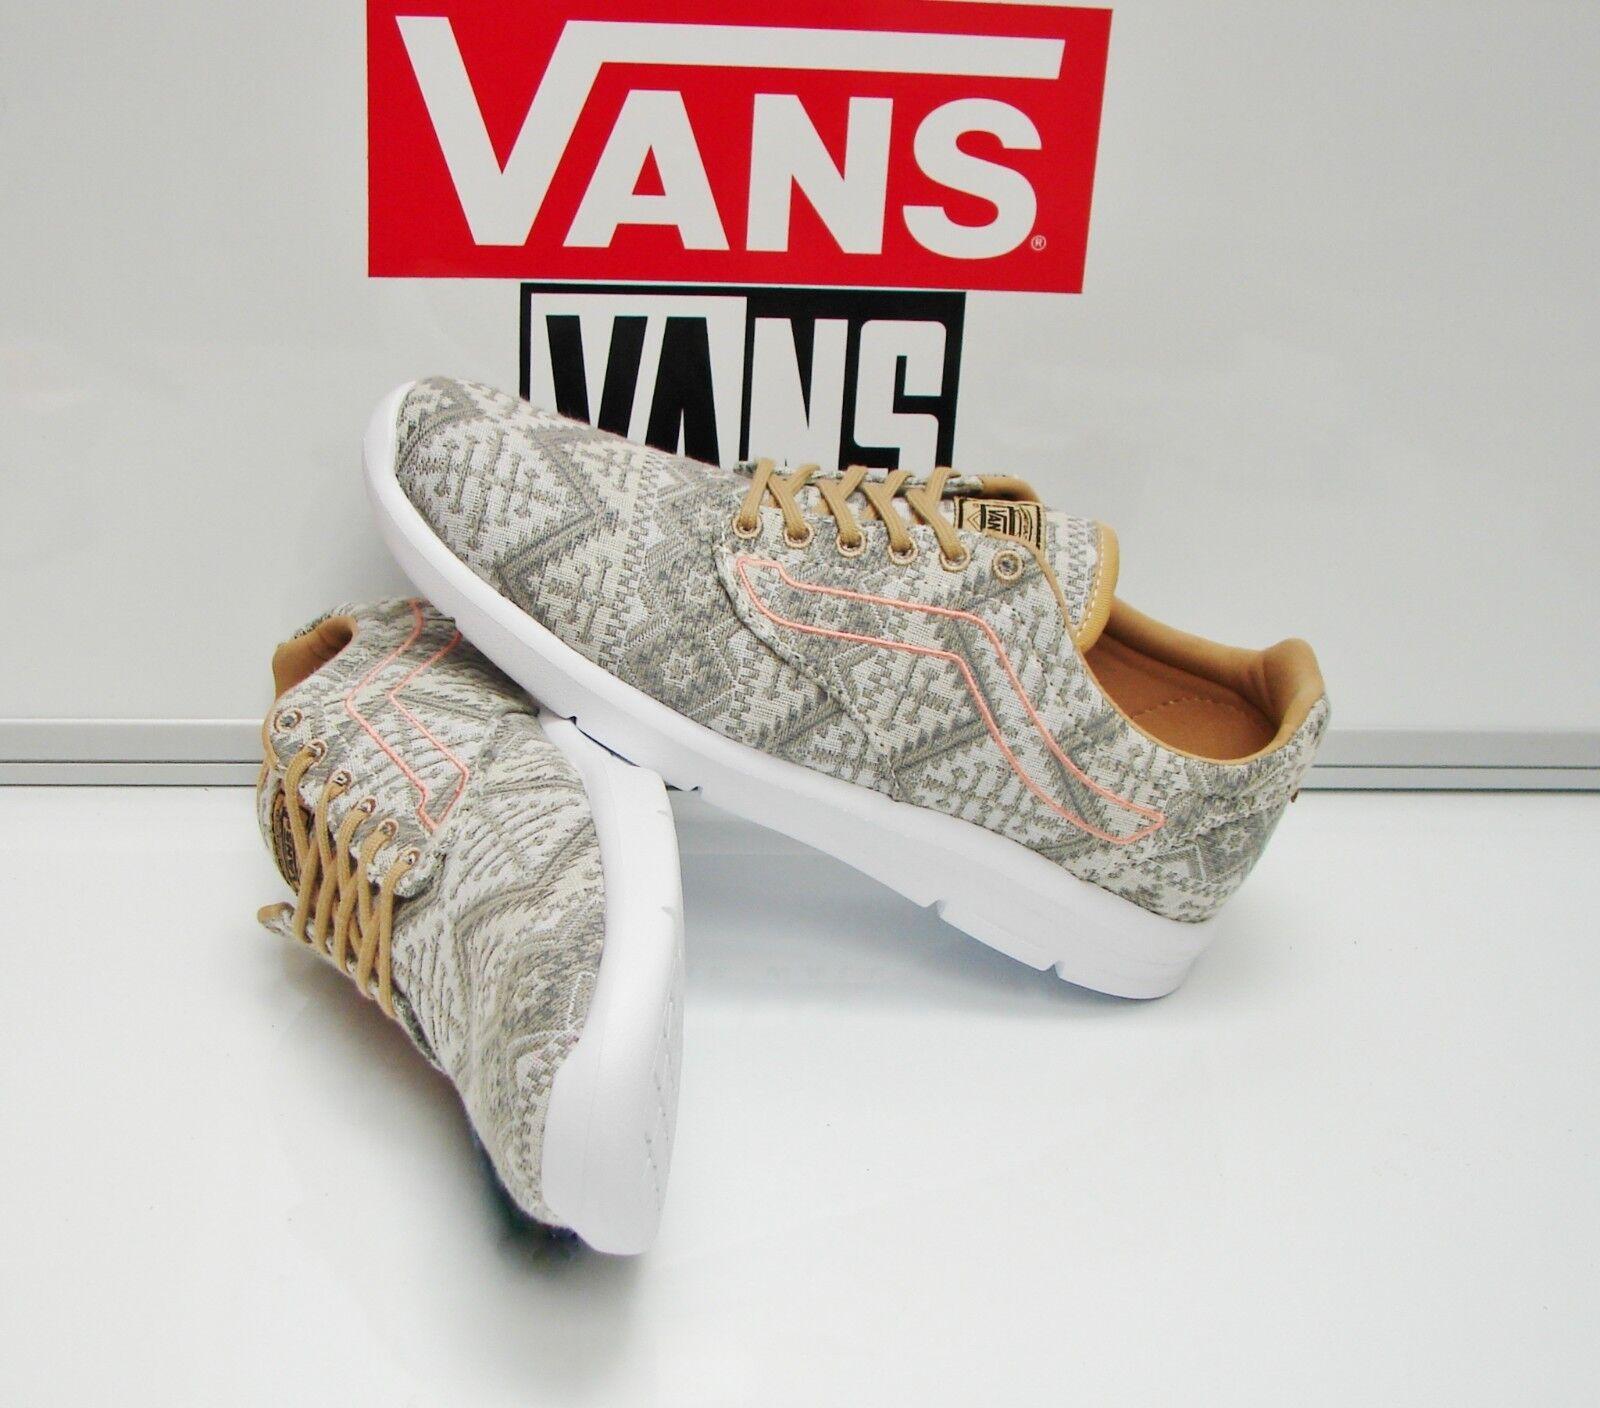 Vans Iso 1.5 Mgoldccan Geo Tan White VN0A2Z5SJXQ Men's Size  7.5